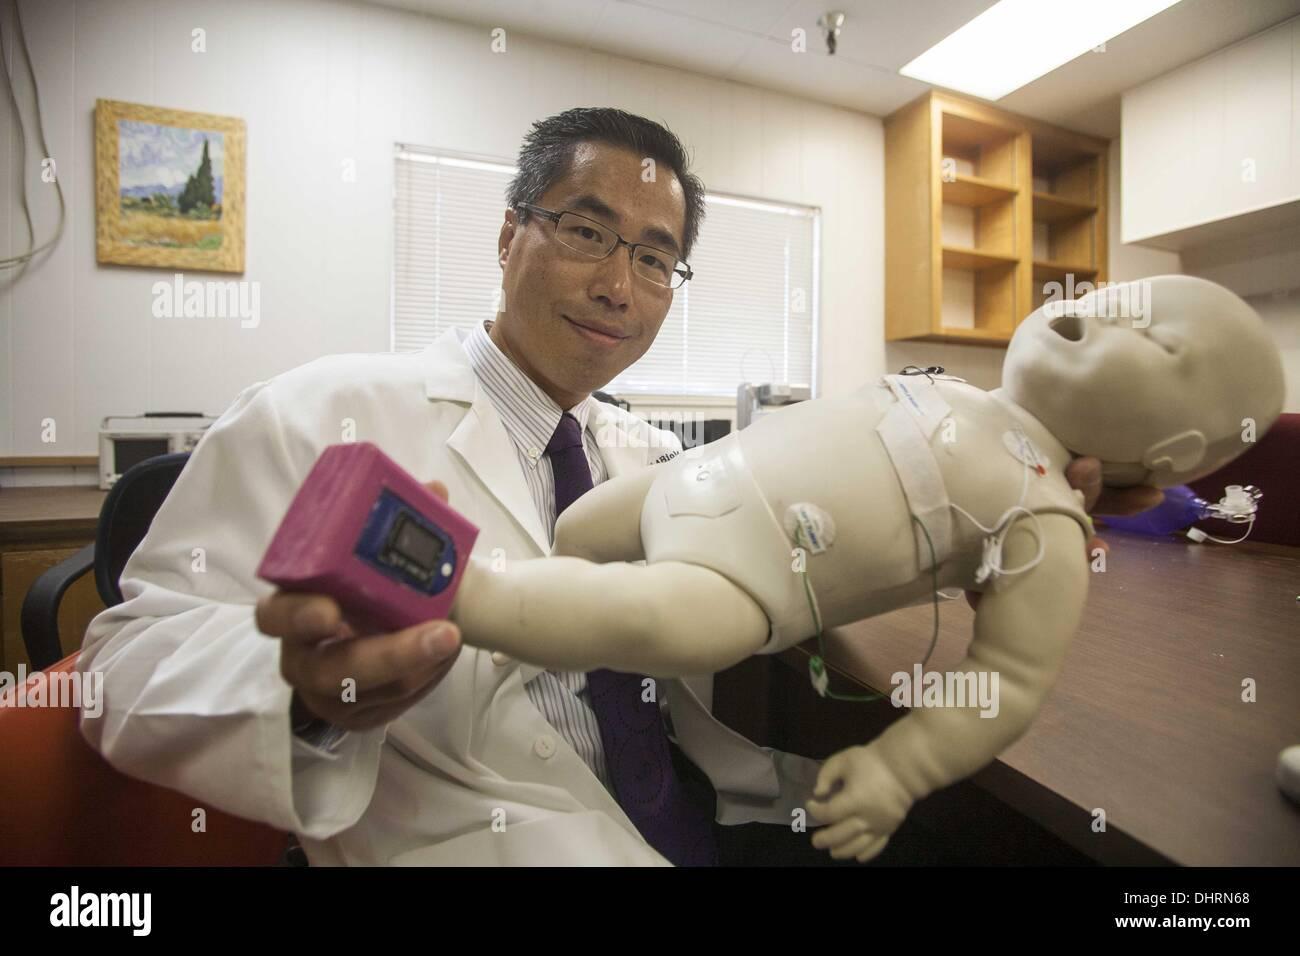 Los Angeles, California, USA. 15th Oct, 2013. Dr. Ruey-Kan Chang, founder of QT Medical, with his Pulse Oximeter. © Ringo Chiu/ZUMAPRESS.com/Alamy Live News - Stock Image